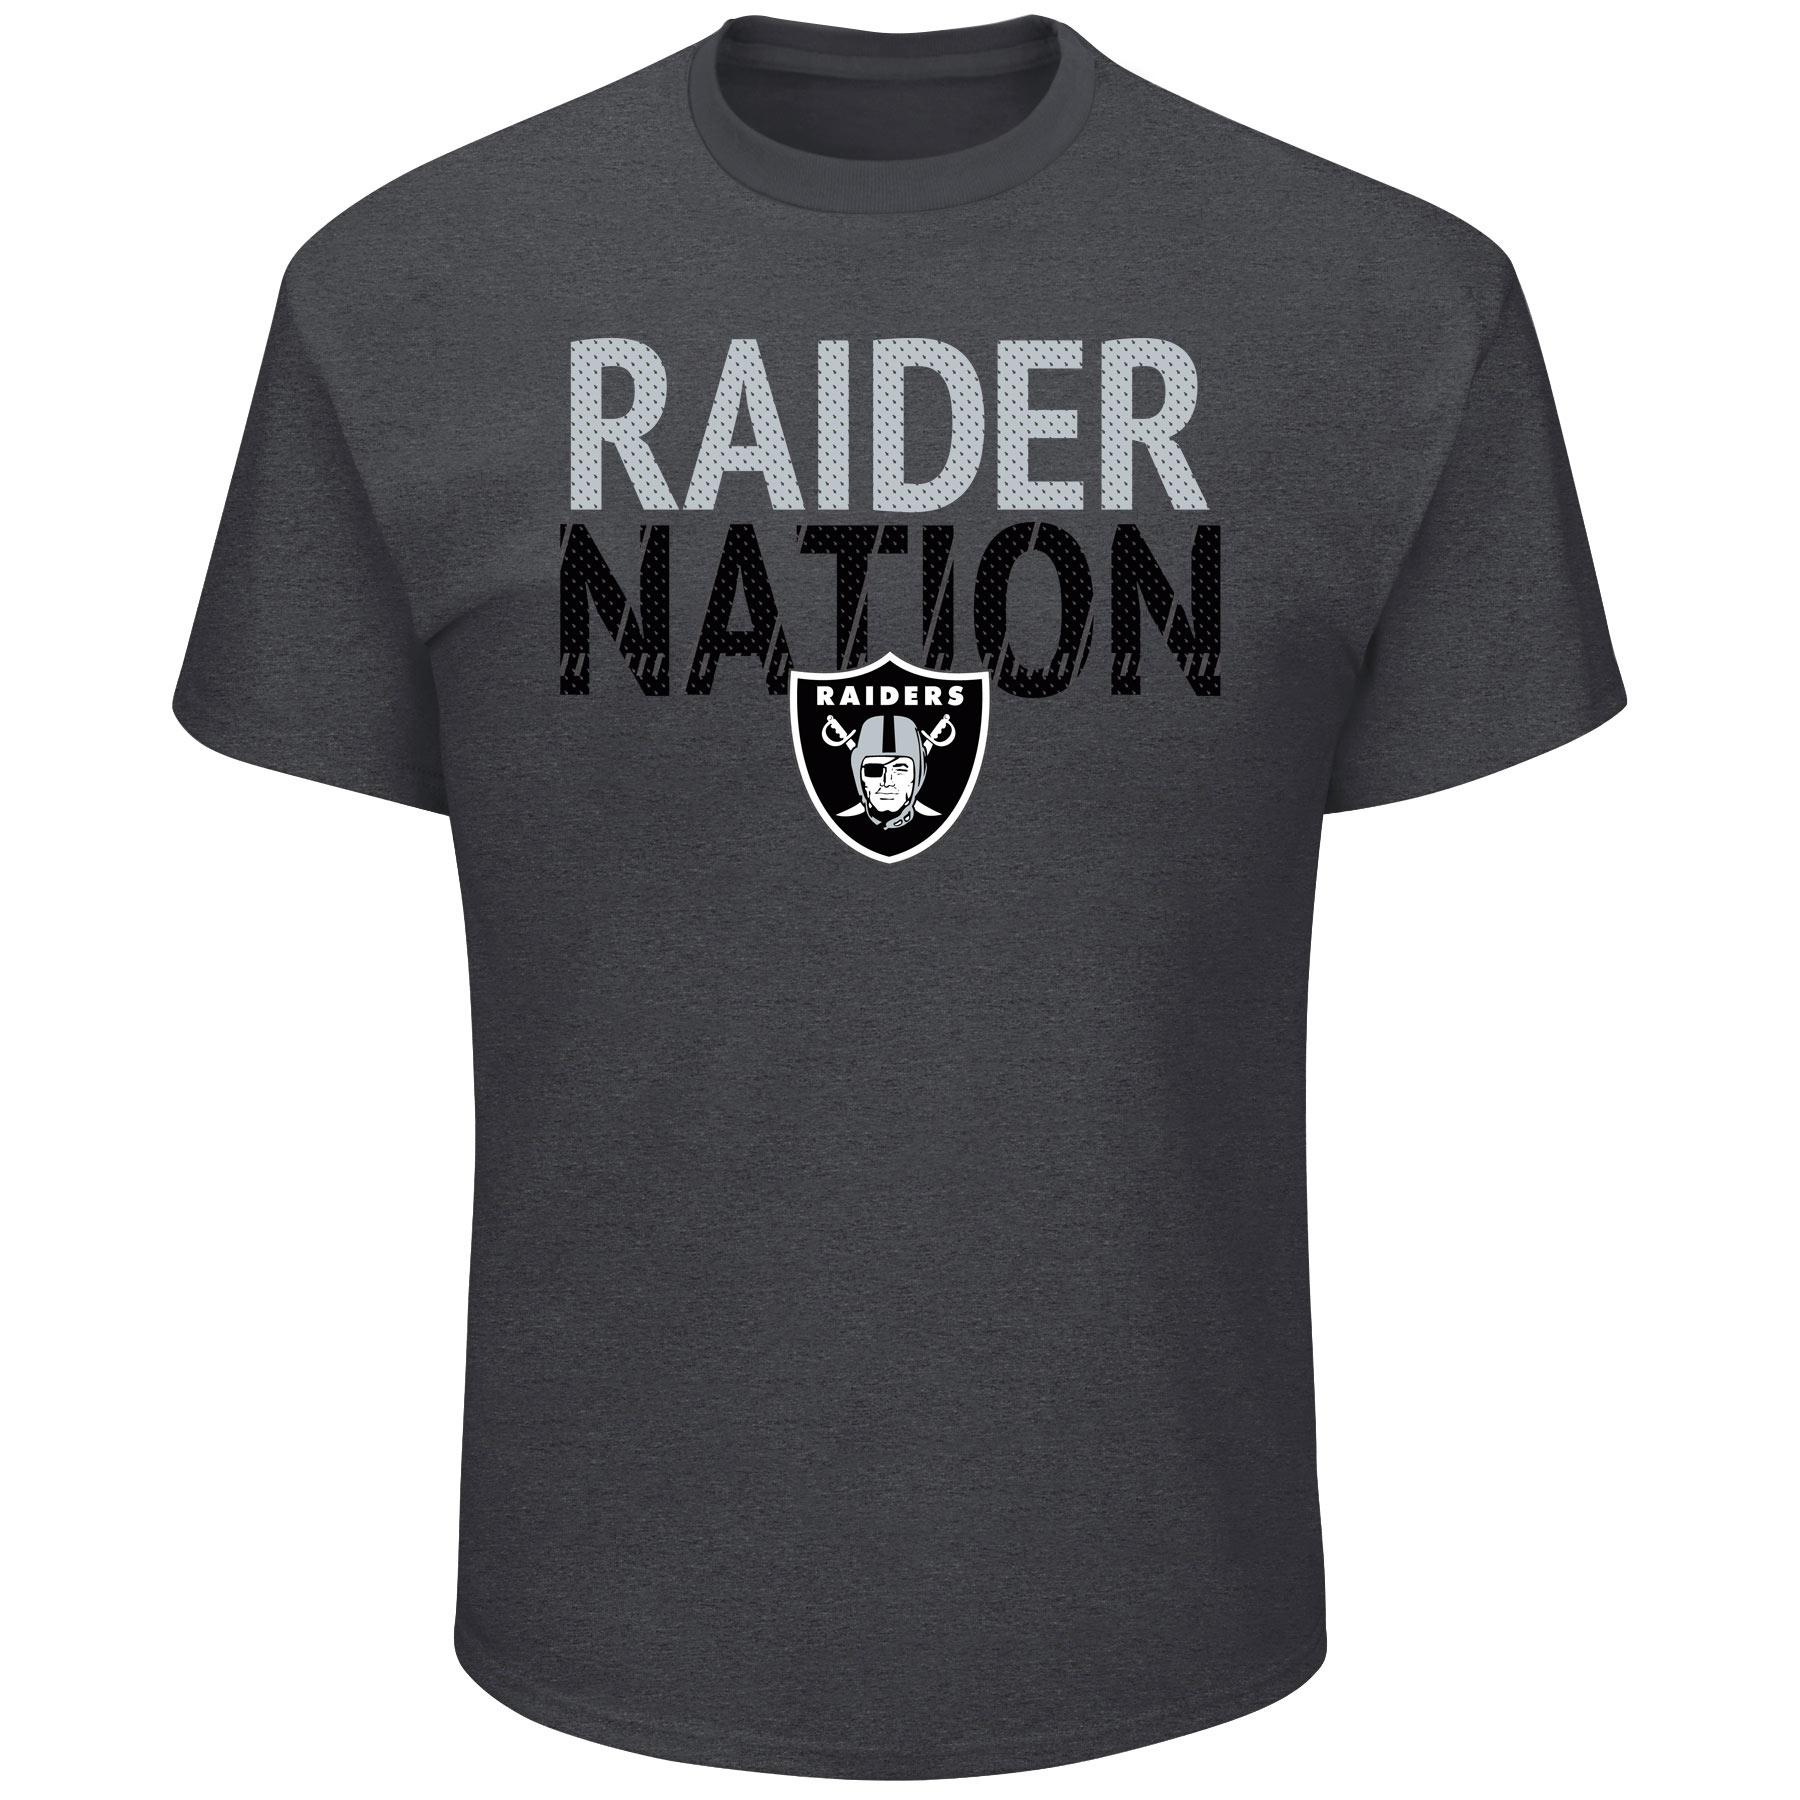 Men's Majestic Heathered Charcoal Oakland Raiders Safety Blitz T-Shirt